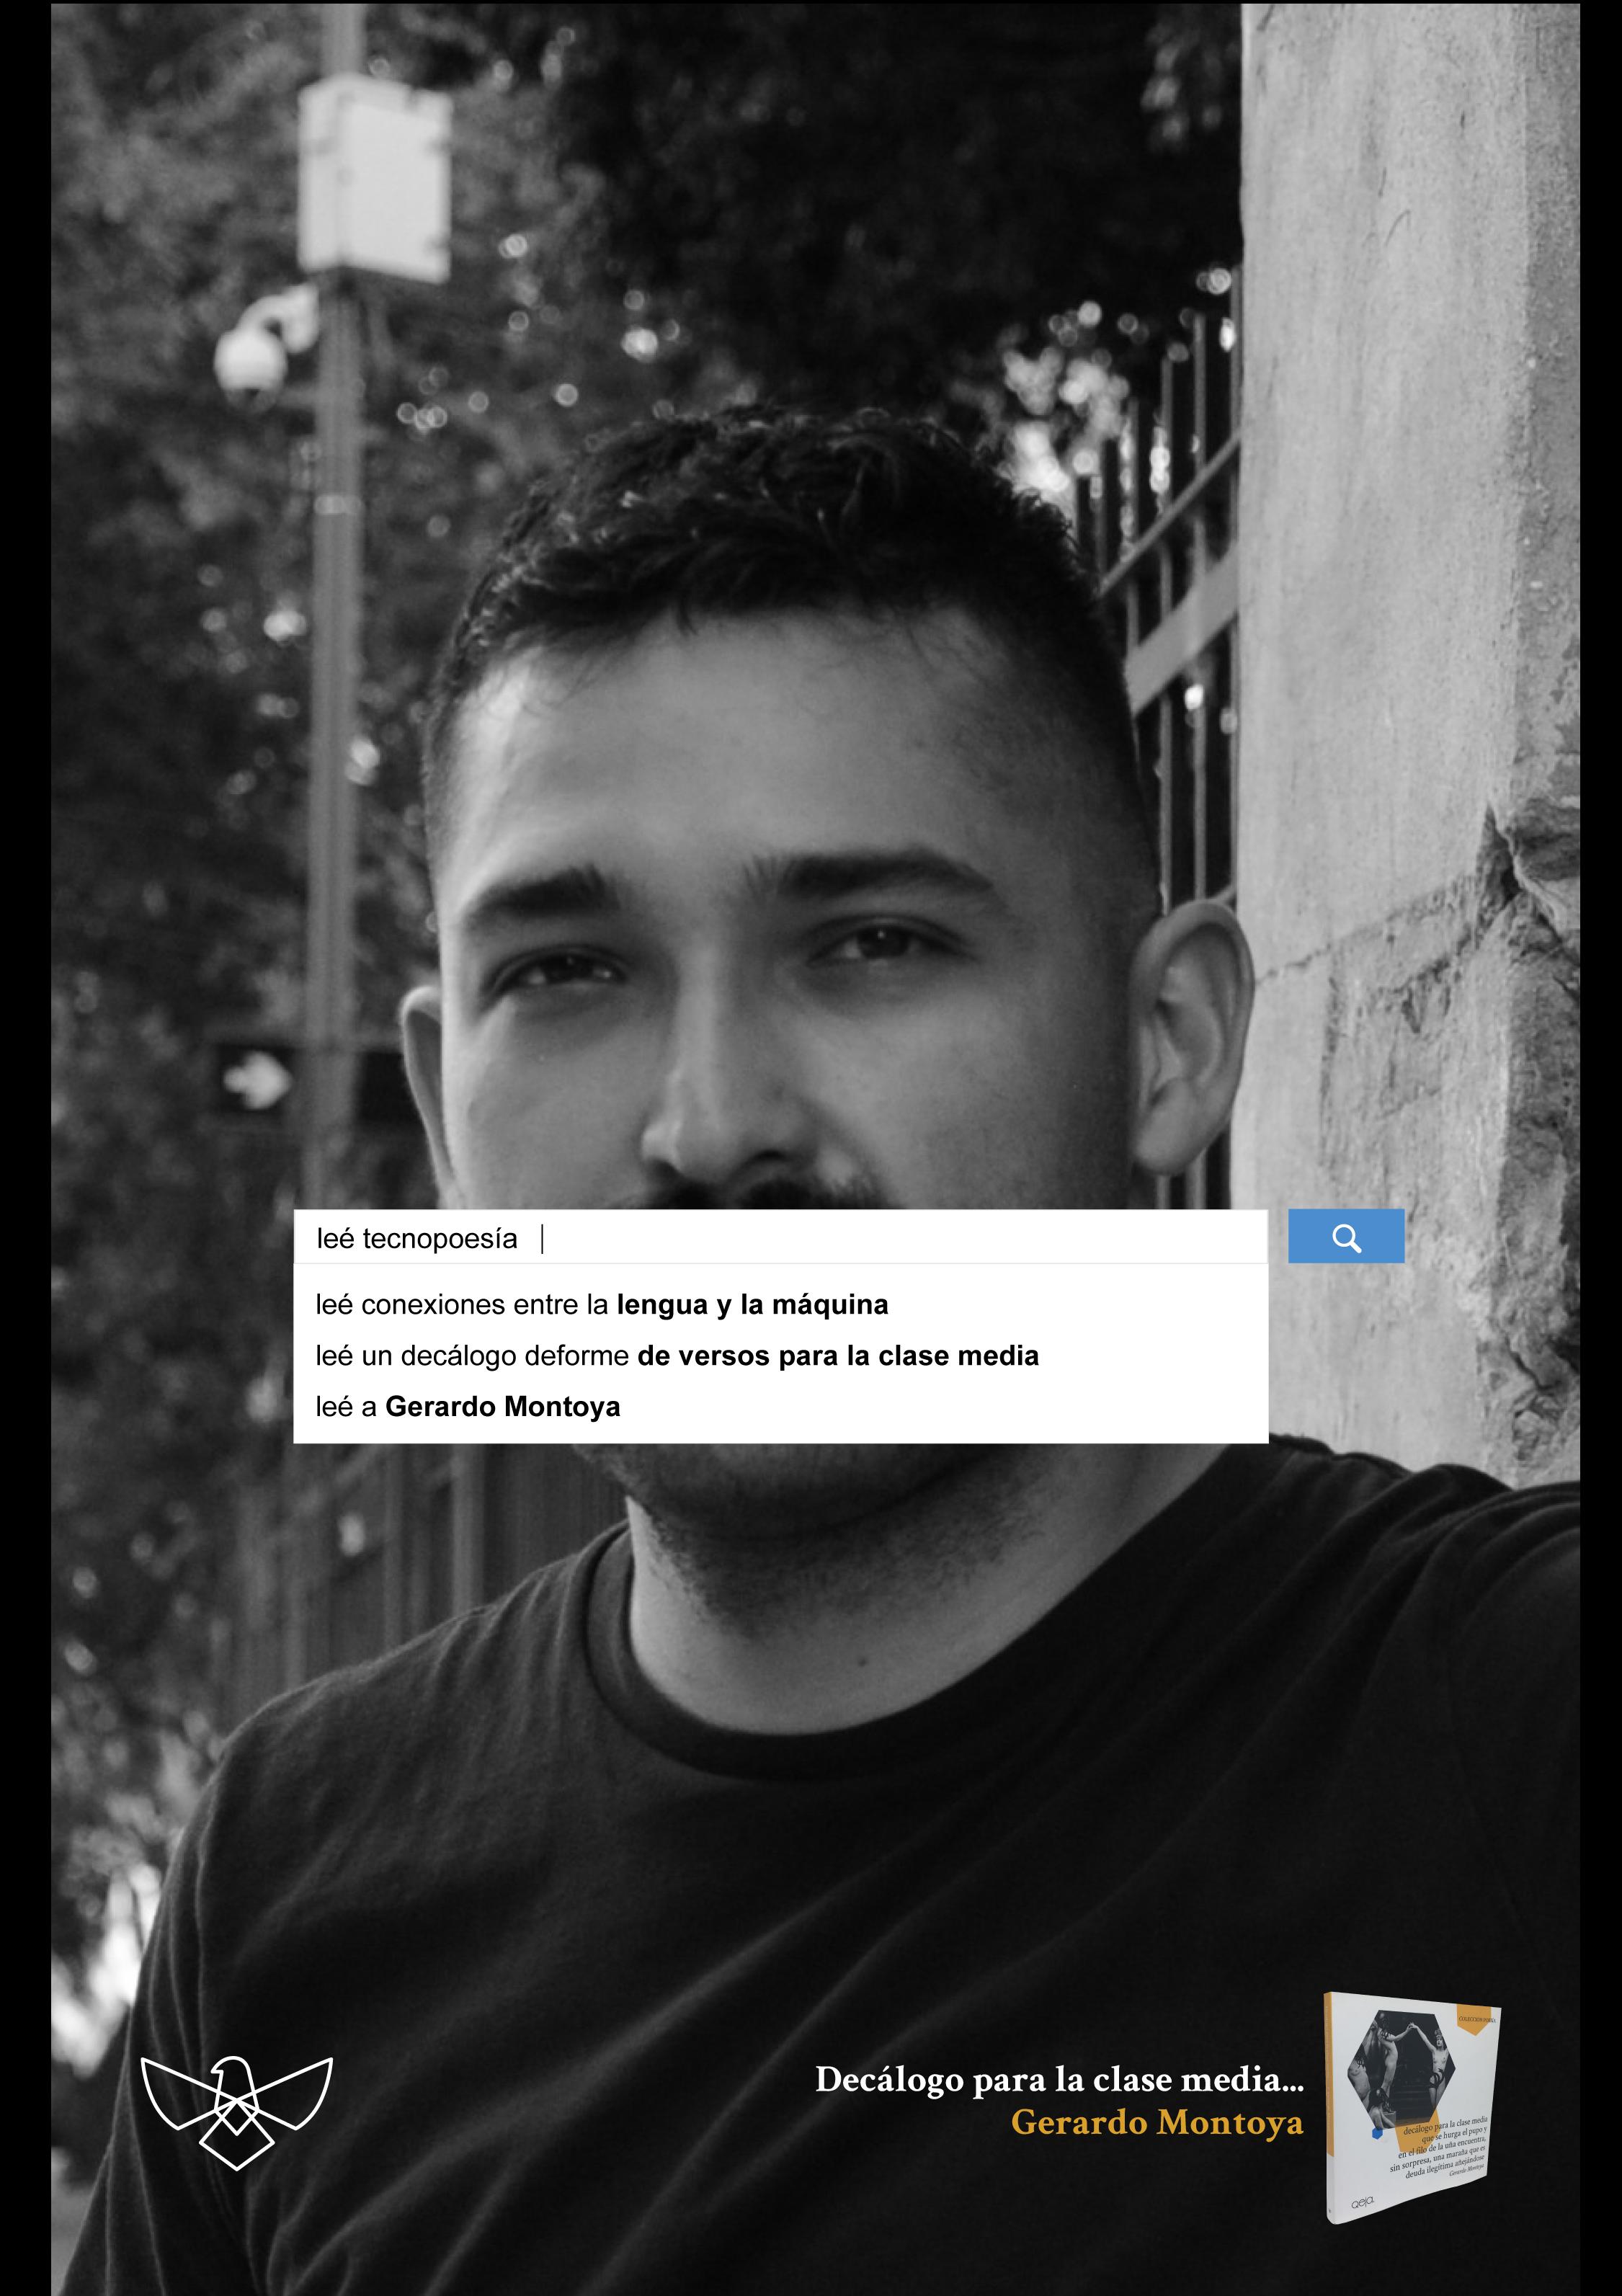 Gerardo_Montoya.png